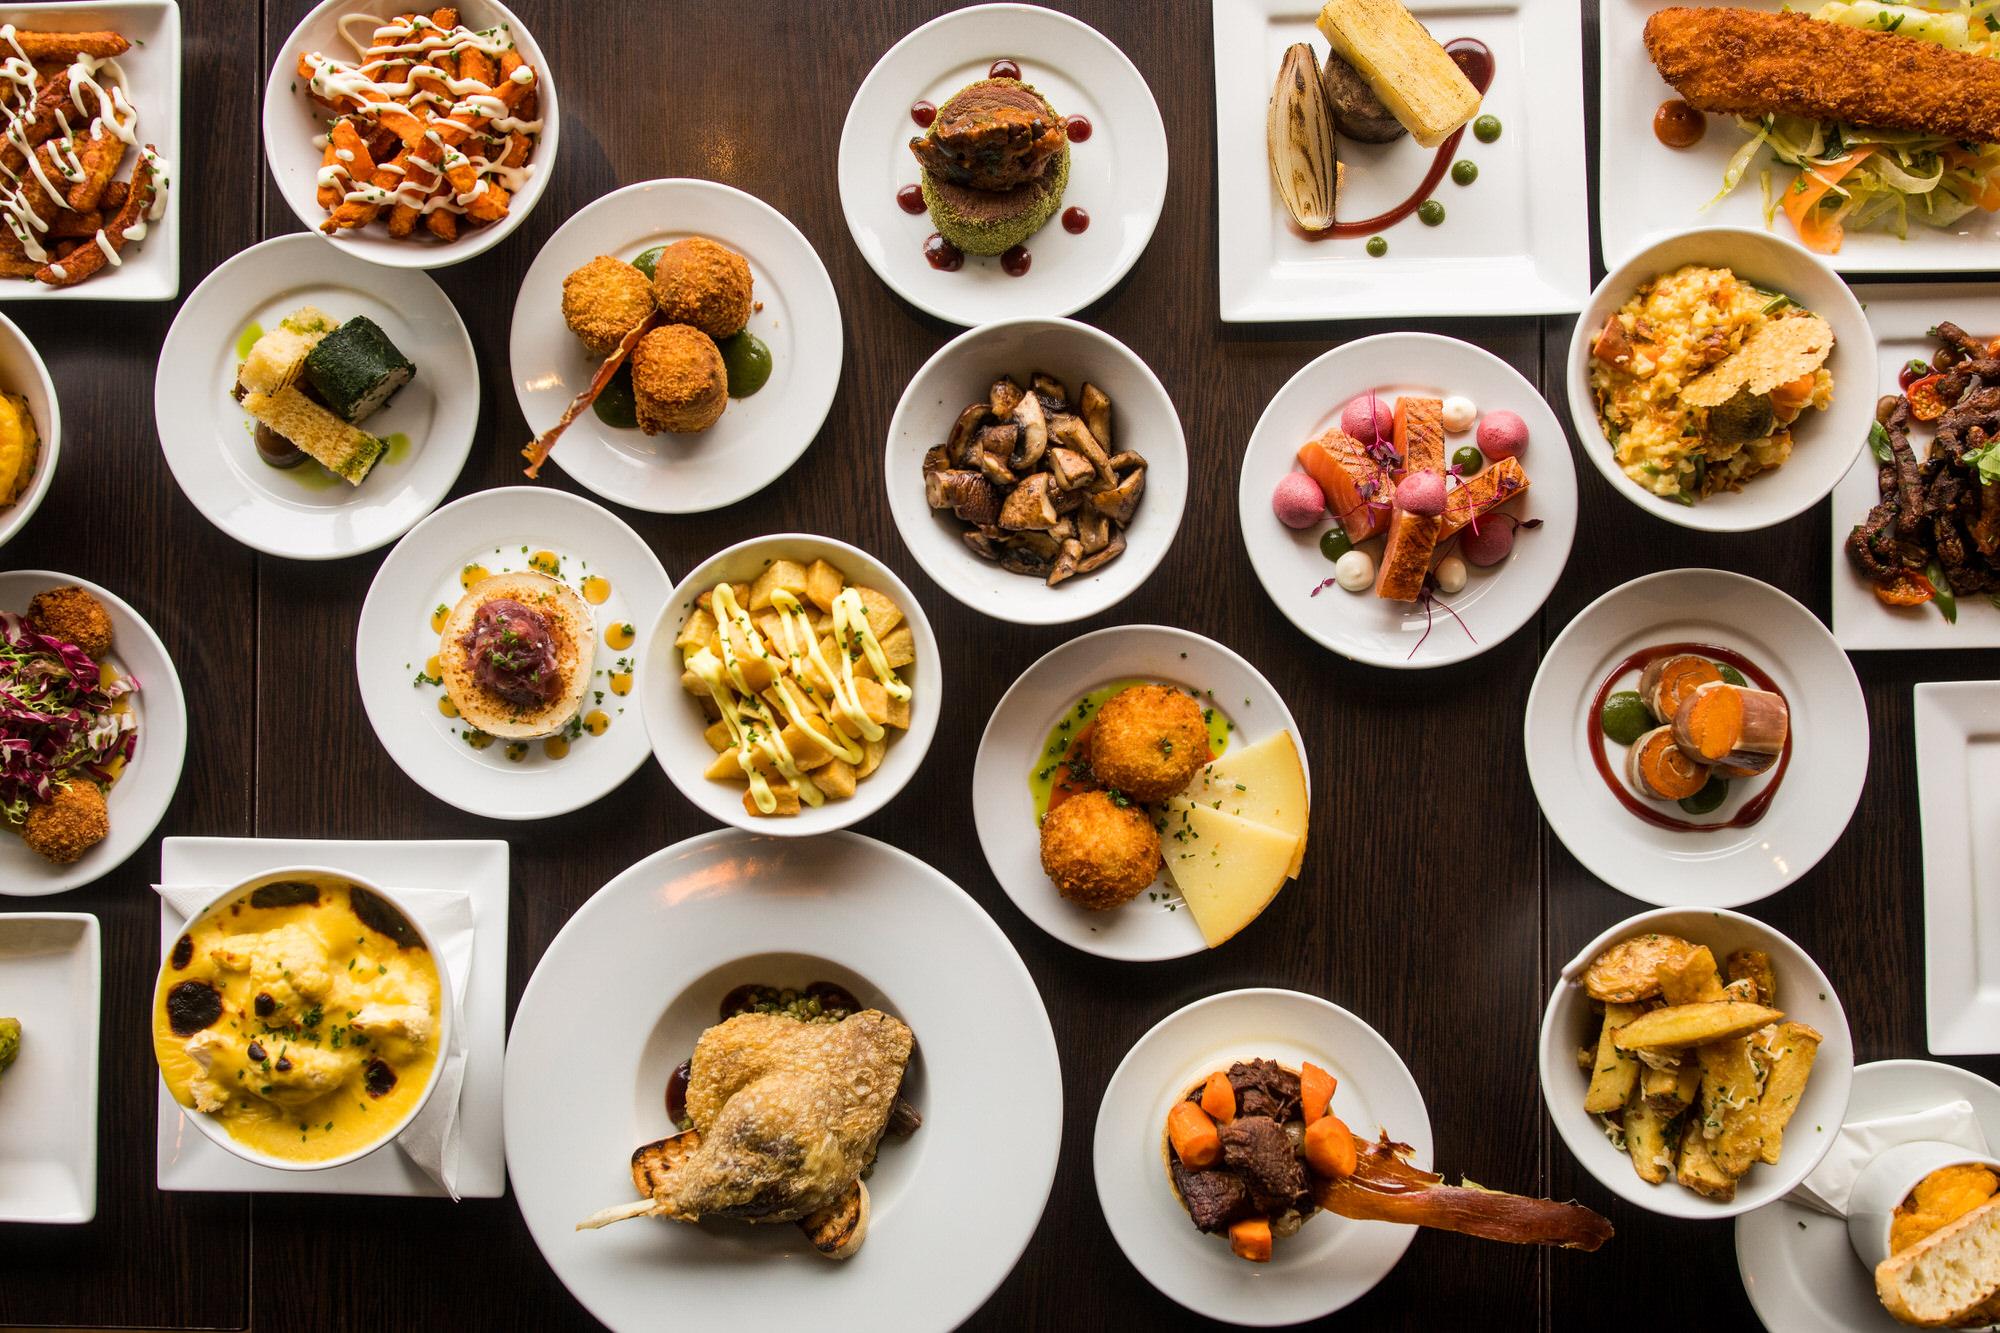 Restaurant-Johnstone-Papamacs-Small-Plates-Cheap-Menu-Renfrewshire-77.jpg